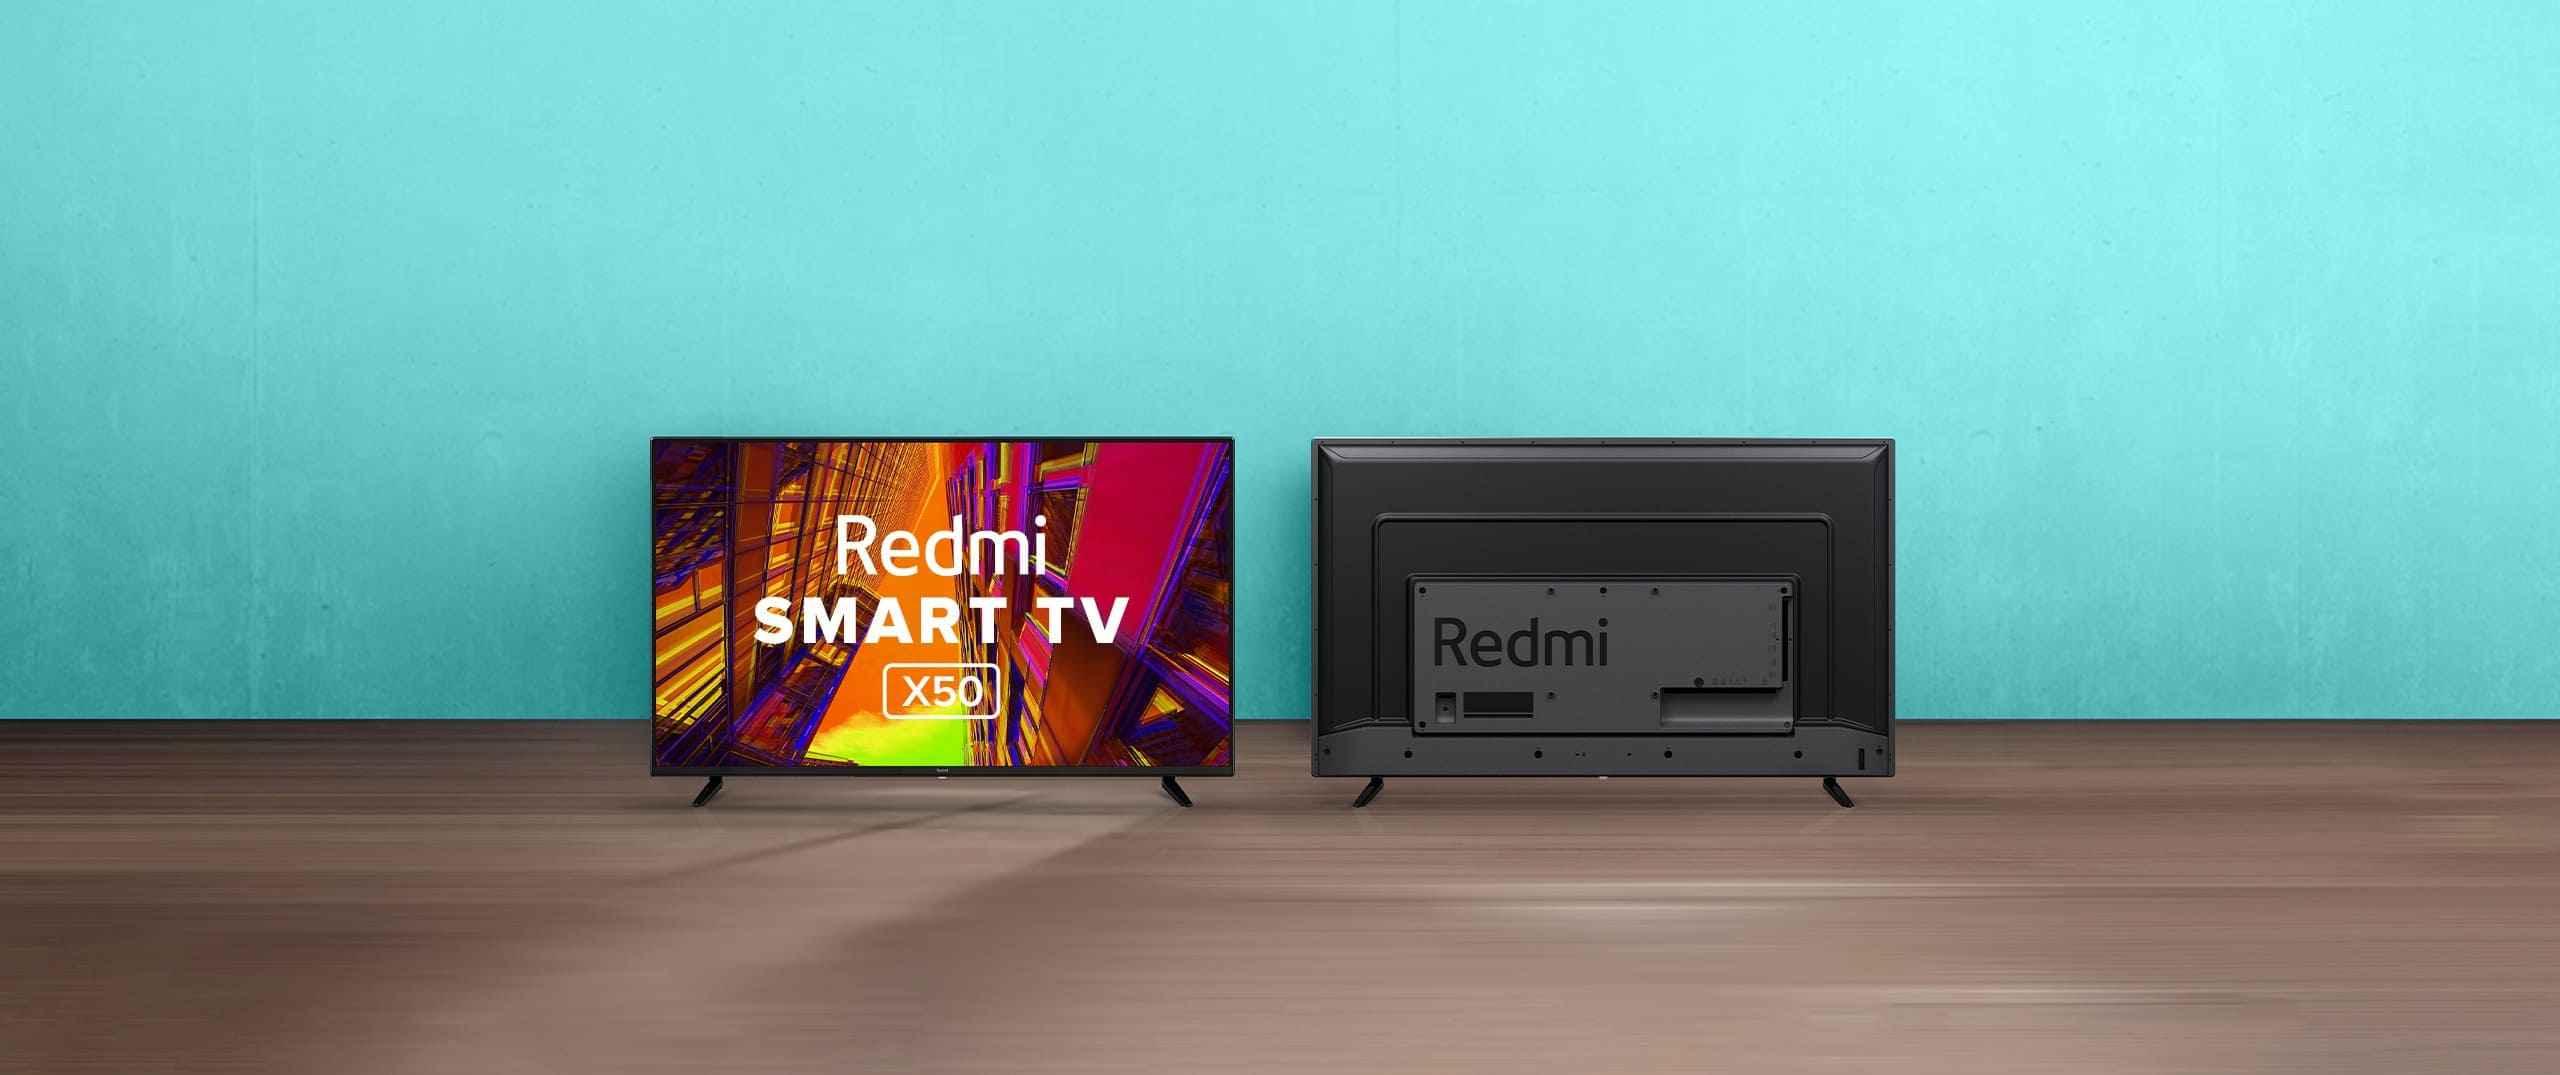 Redmi Smart Tv colour varient